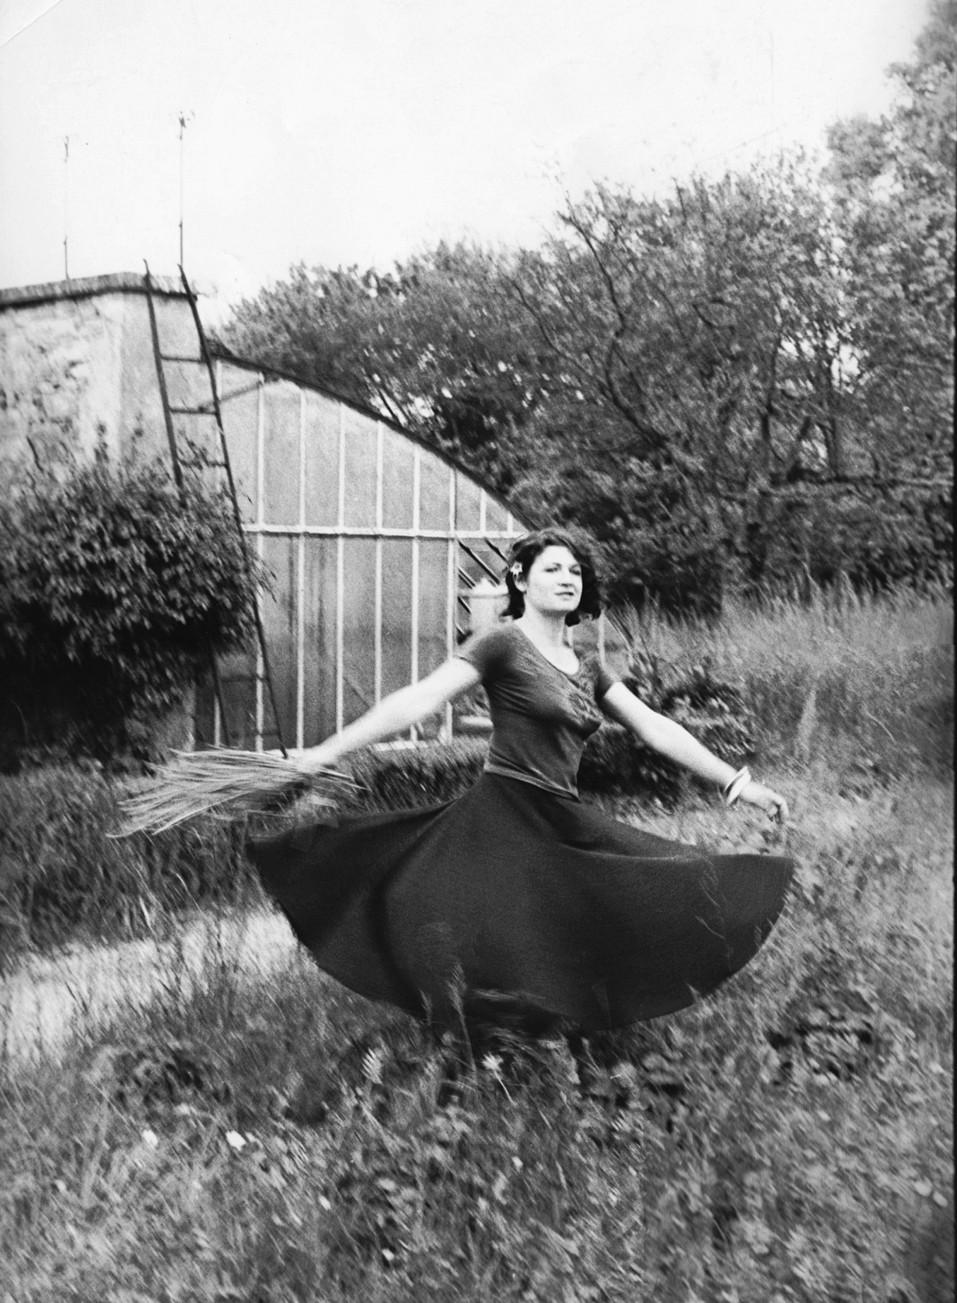 Jacqueline - Corgenon, 1980